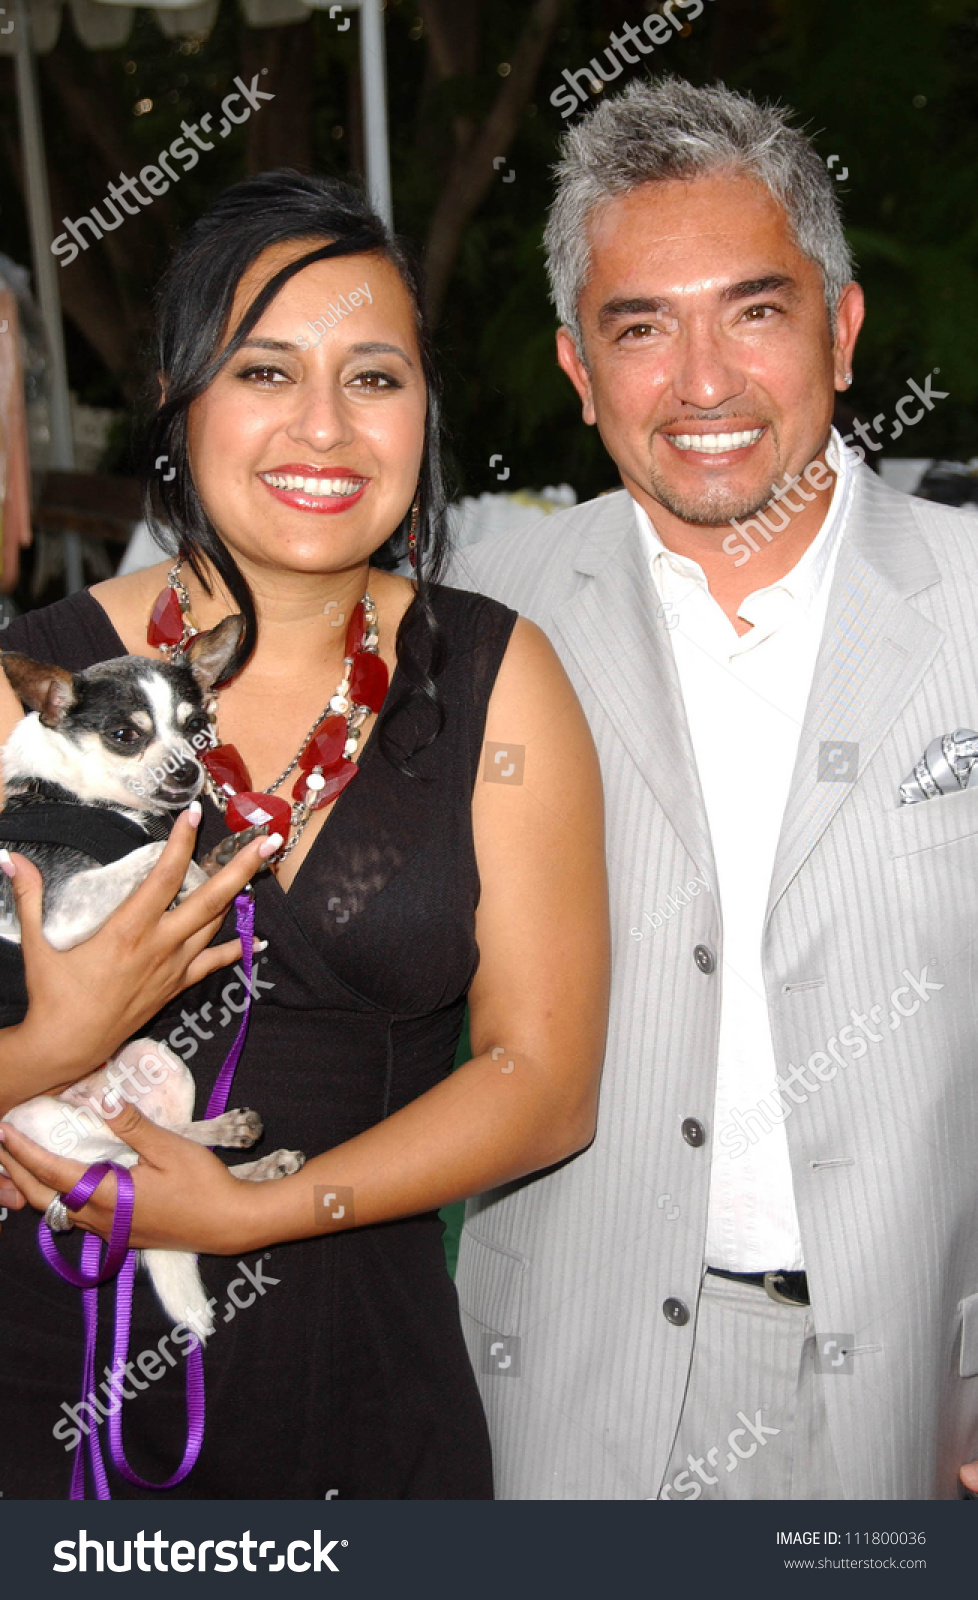 Is married to who cesar millan Cesar Millan